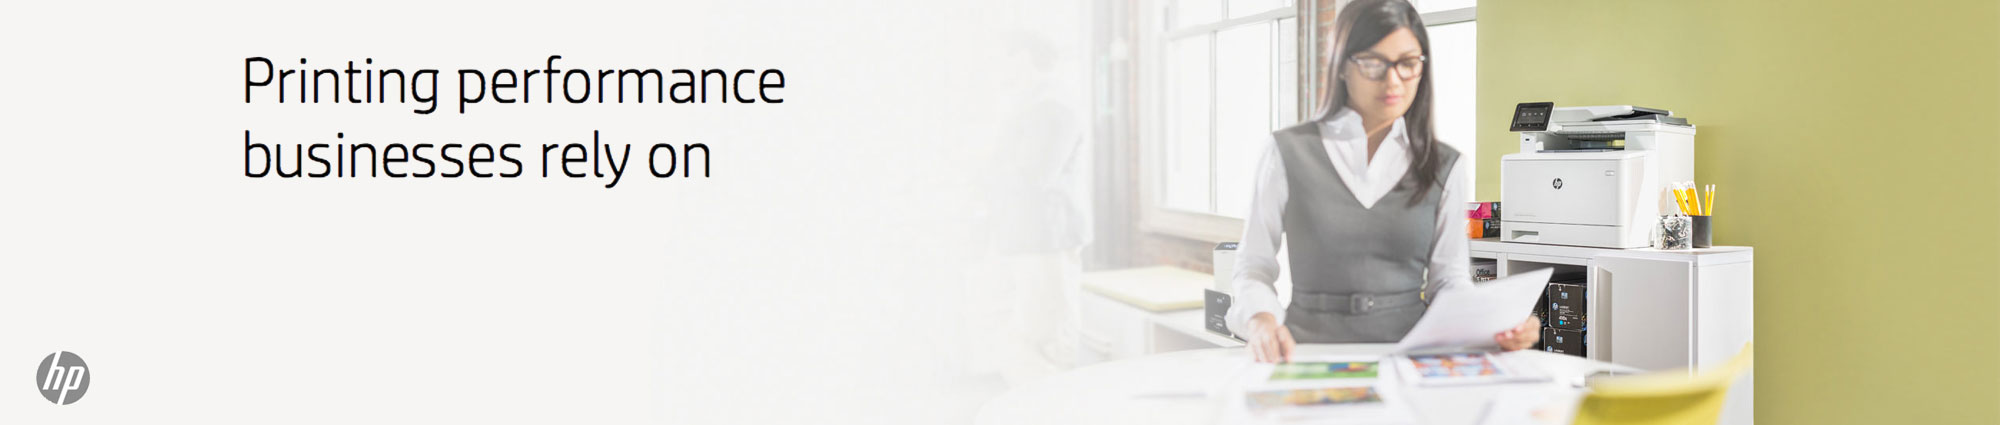 http://dpyxfisjd0mft.cloudfront.net/lab9-2/B2B/Sliders_B2B/Office%20Printing/Banner-OfficePrinting-HP.jpg?1455203555&w=2000&h=425